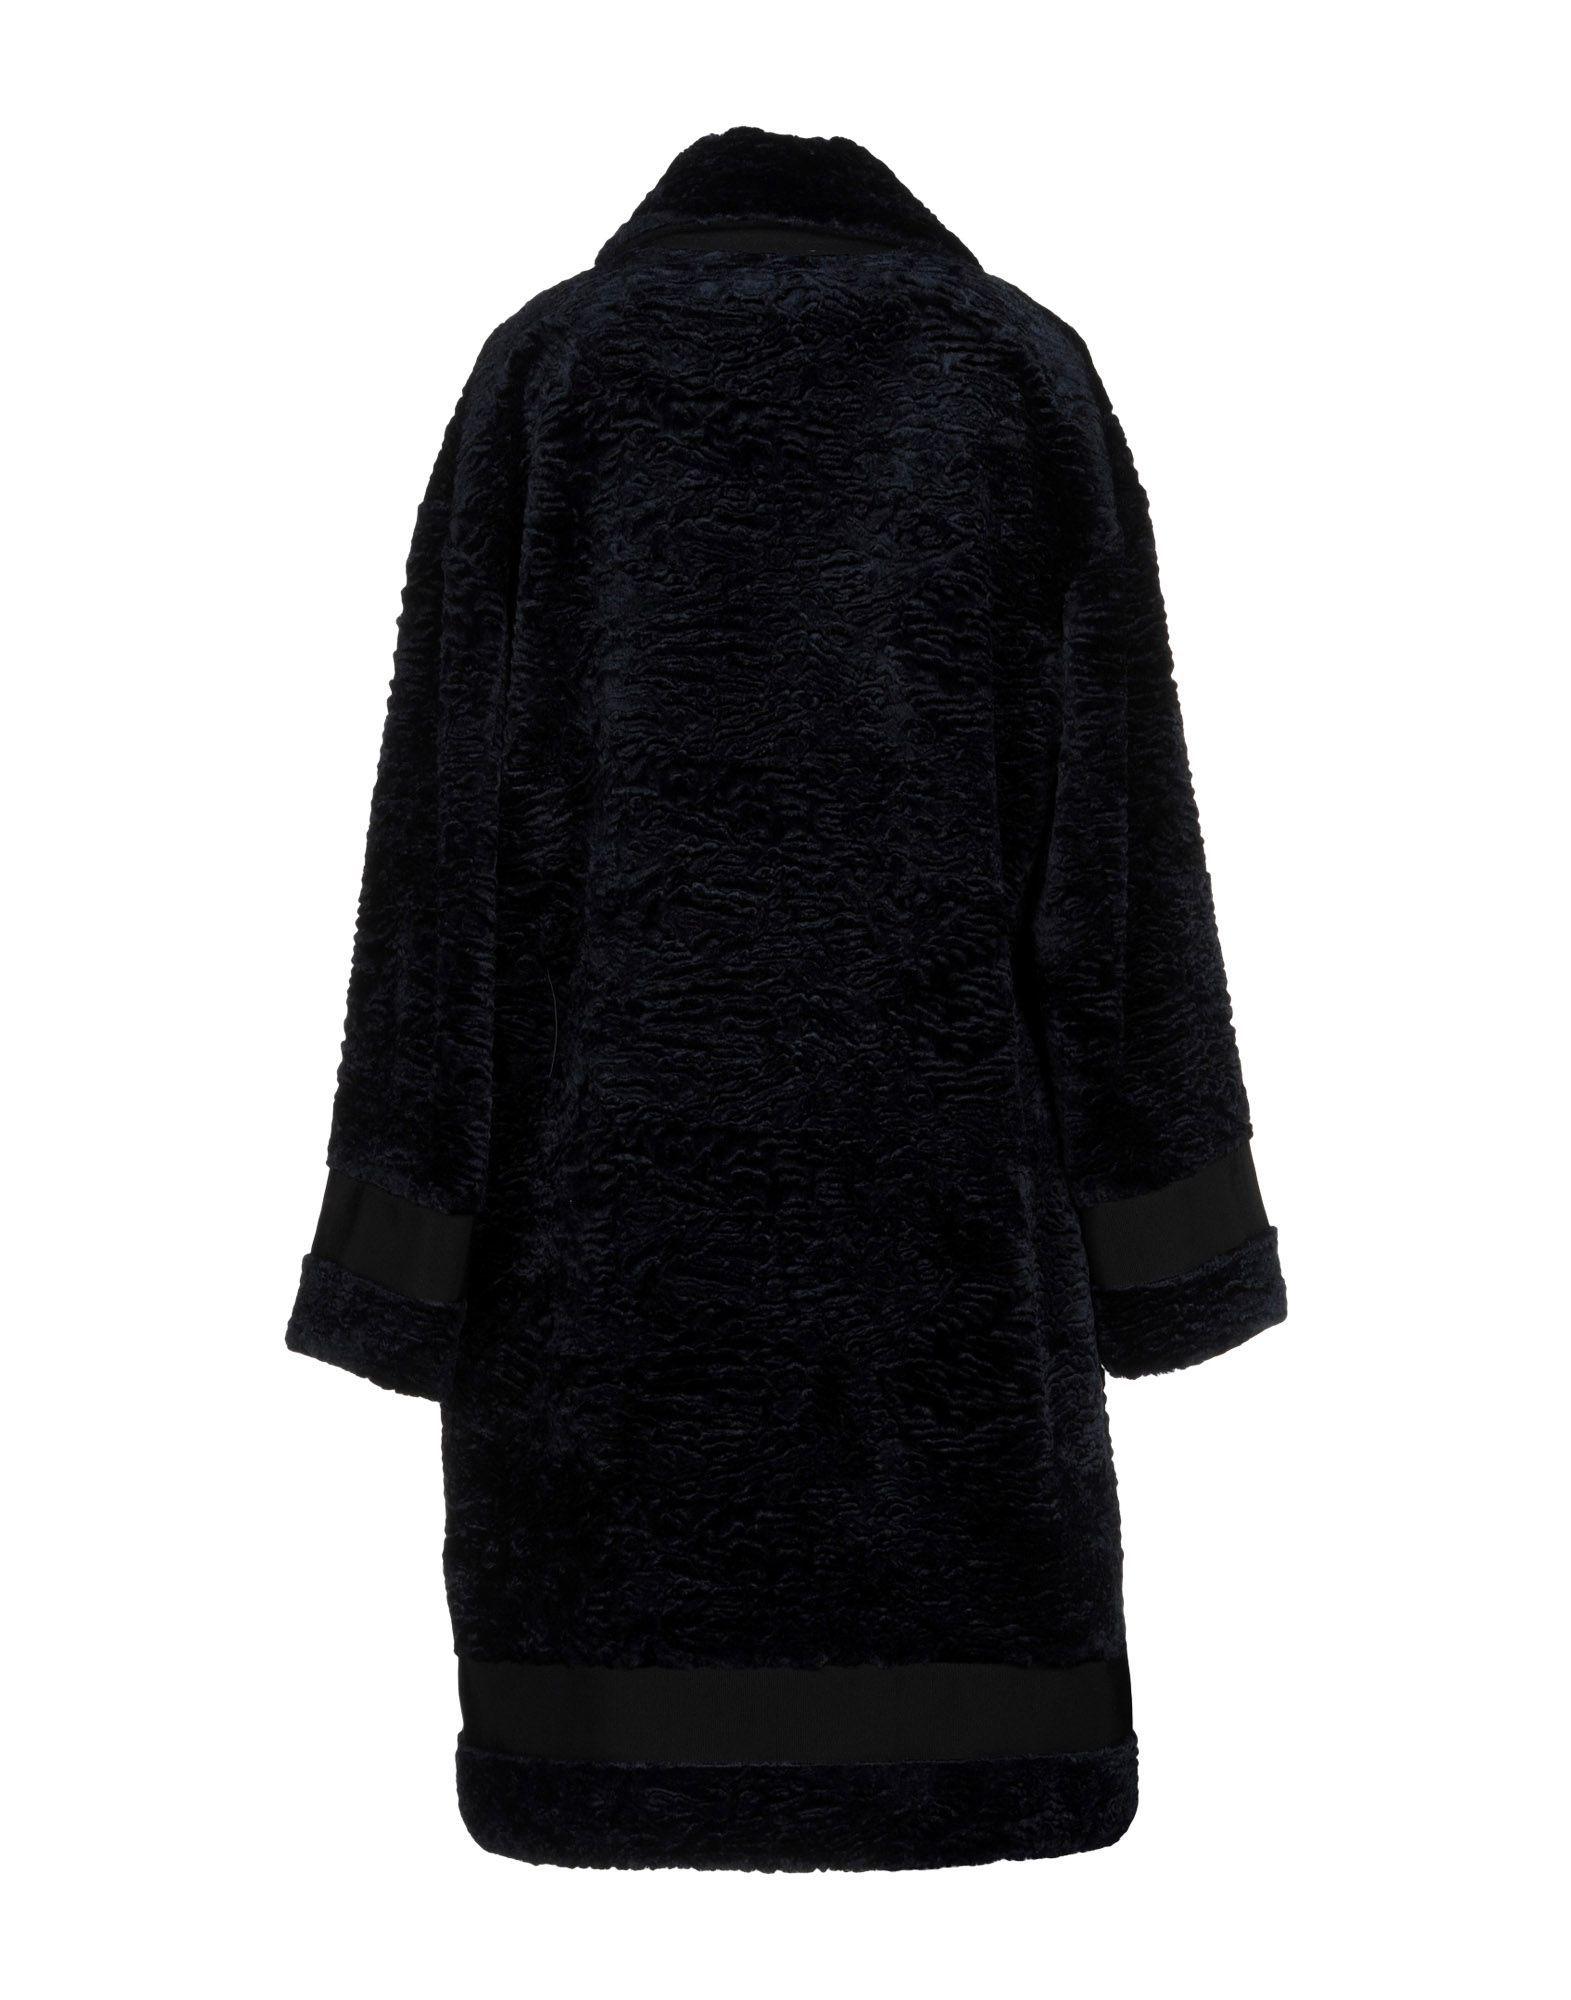 Victoria, Victoria Beckham Dark Blue Faux Fur Coat